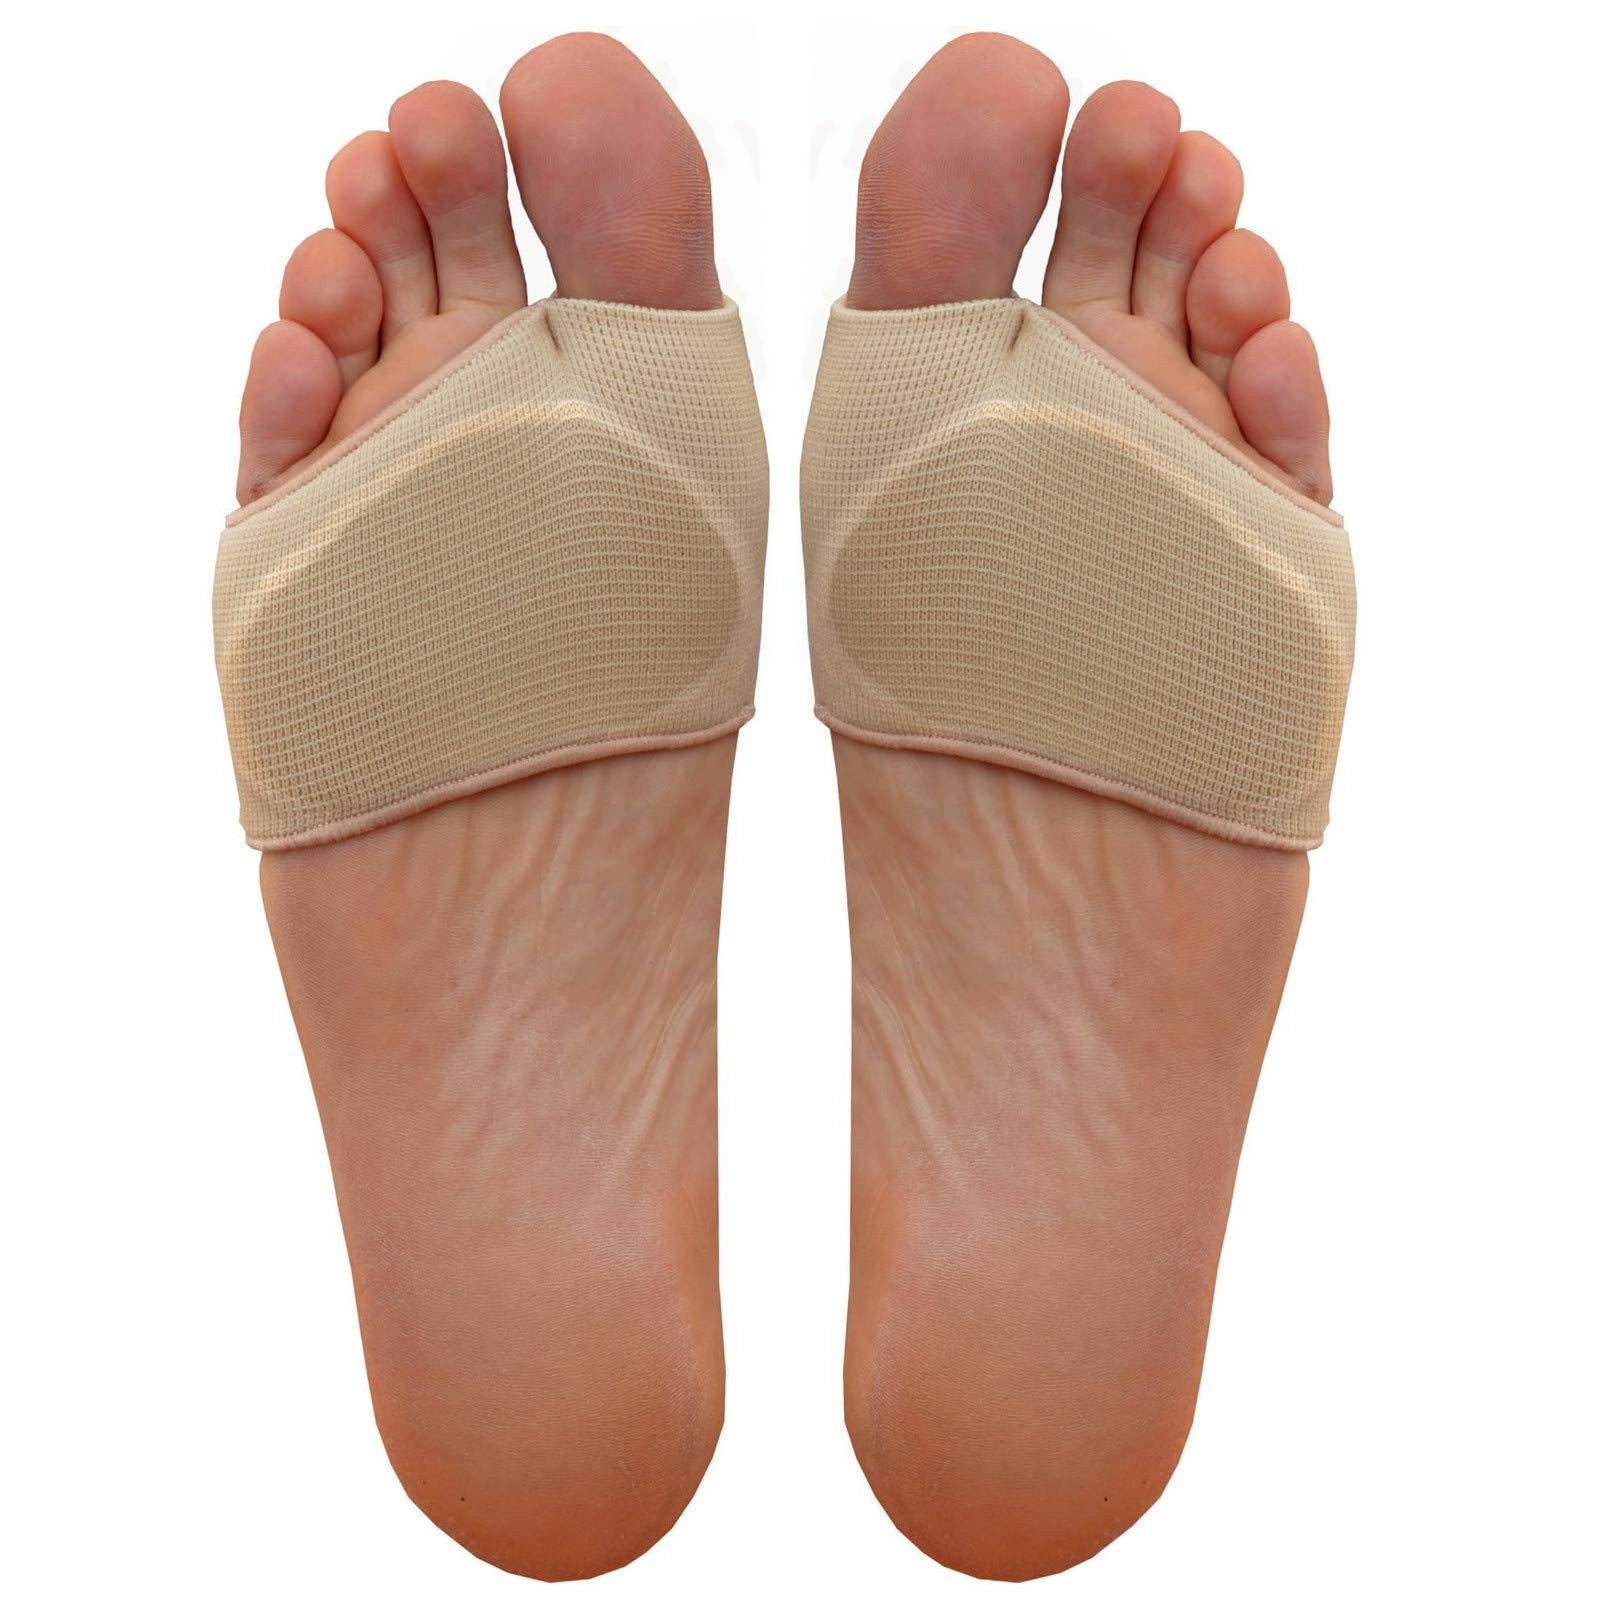 Medipaq® Metatarsal Gel Cushion - Relieve Ball of Foot Pain Now!